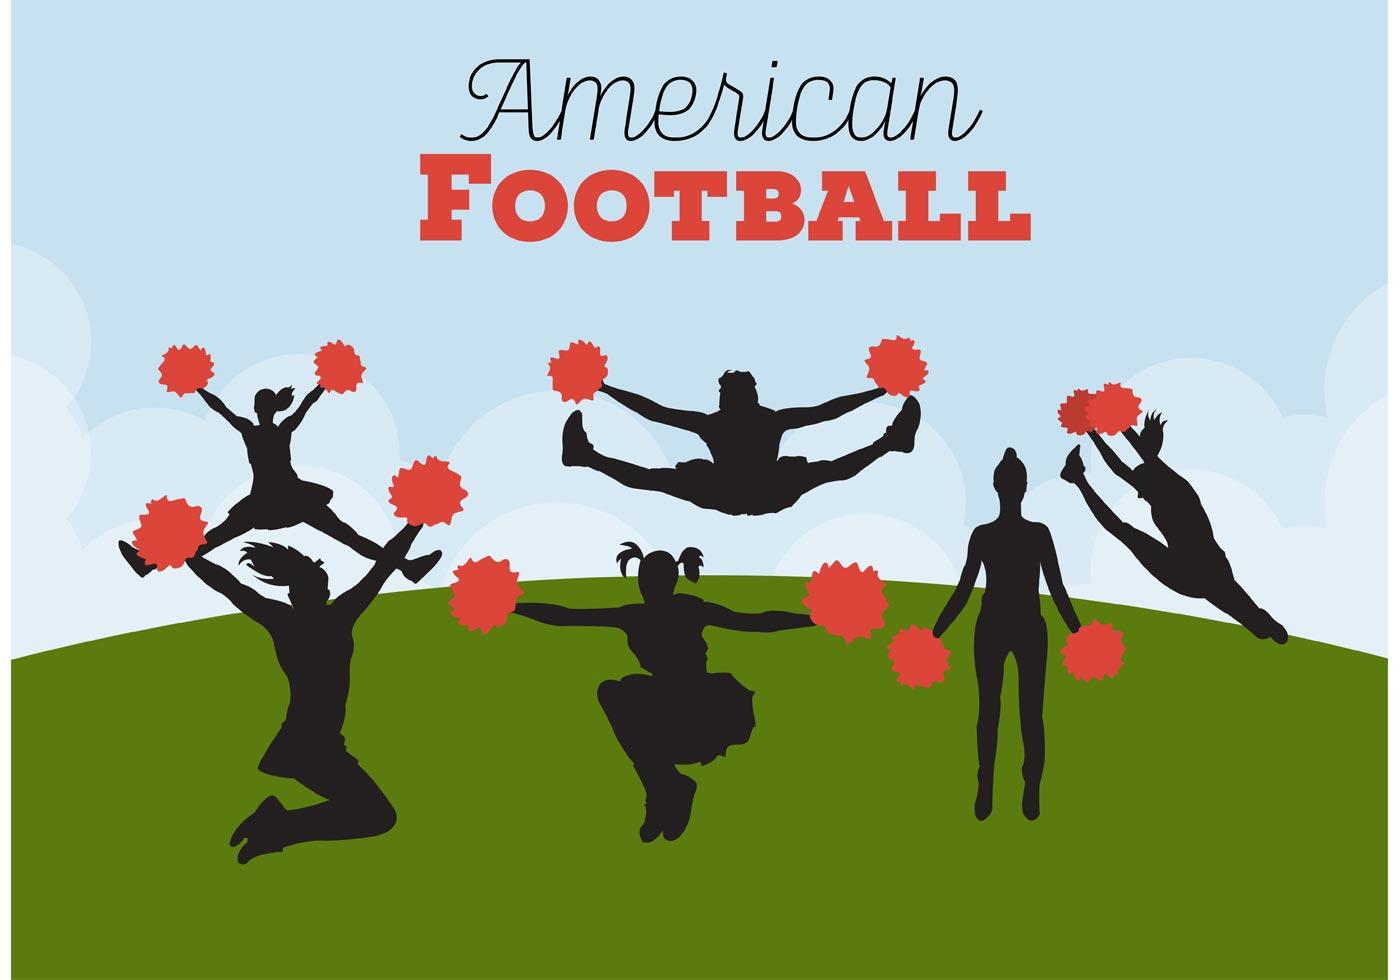 Football Cheerleading Backgrounds Download Free Vectors